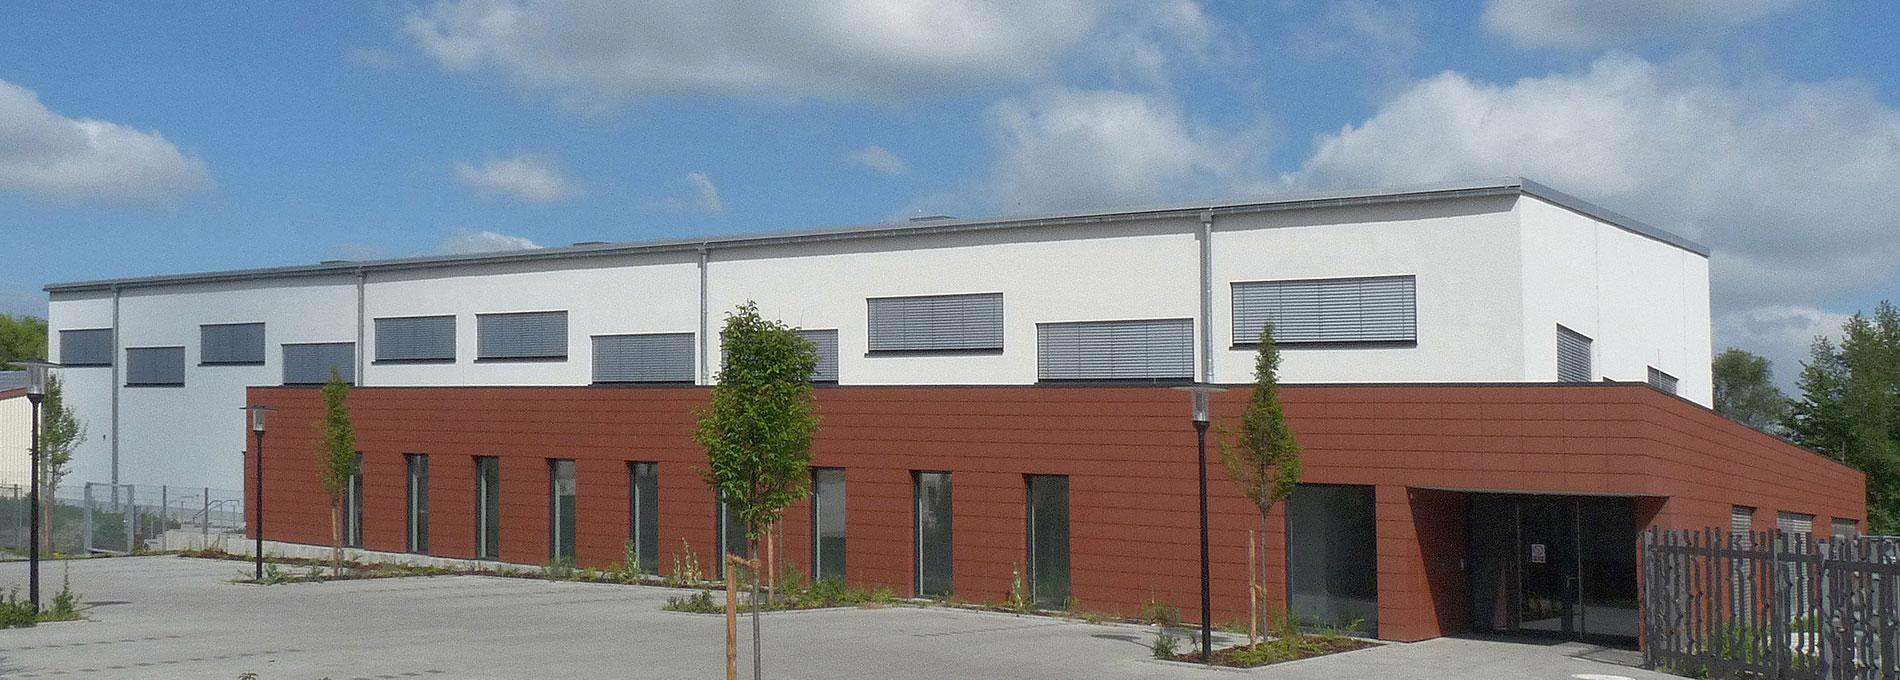 Sporthalle Bobenheim Roxheim